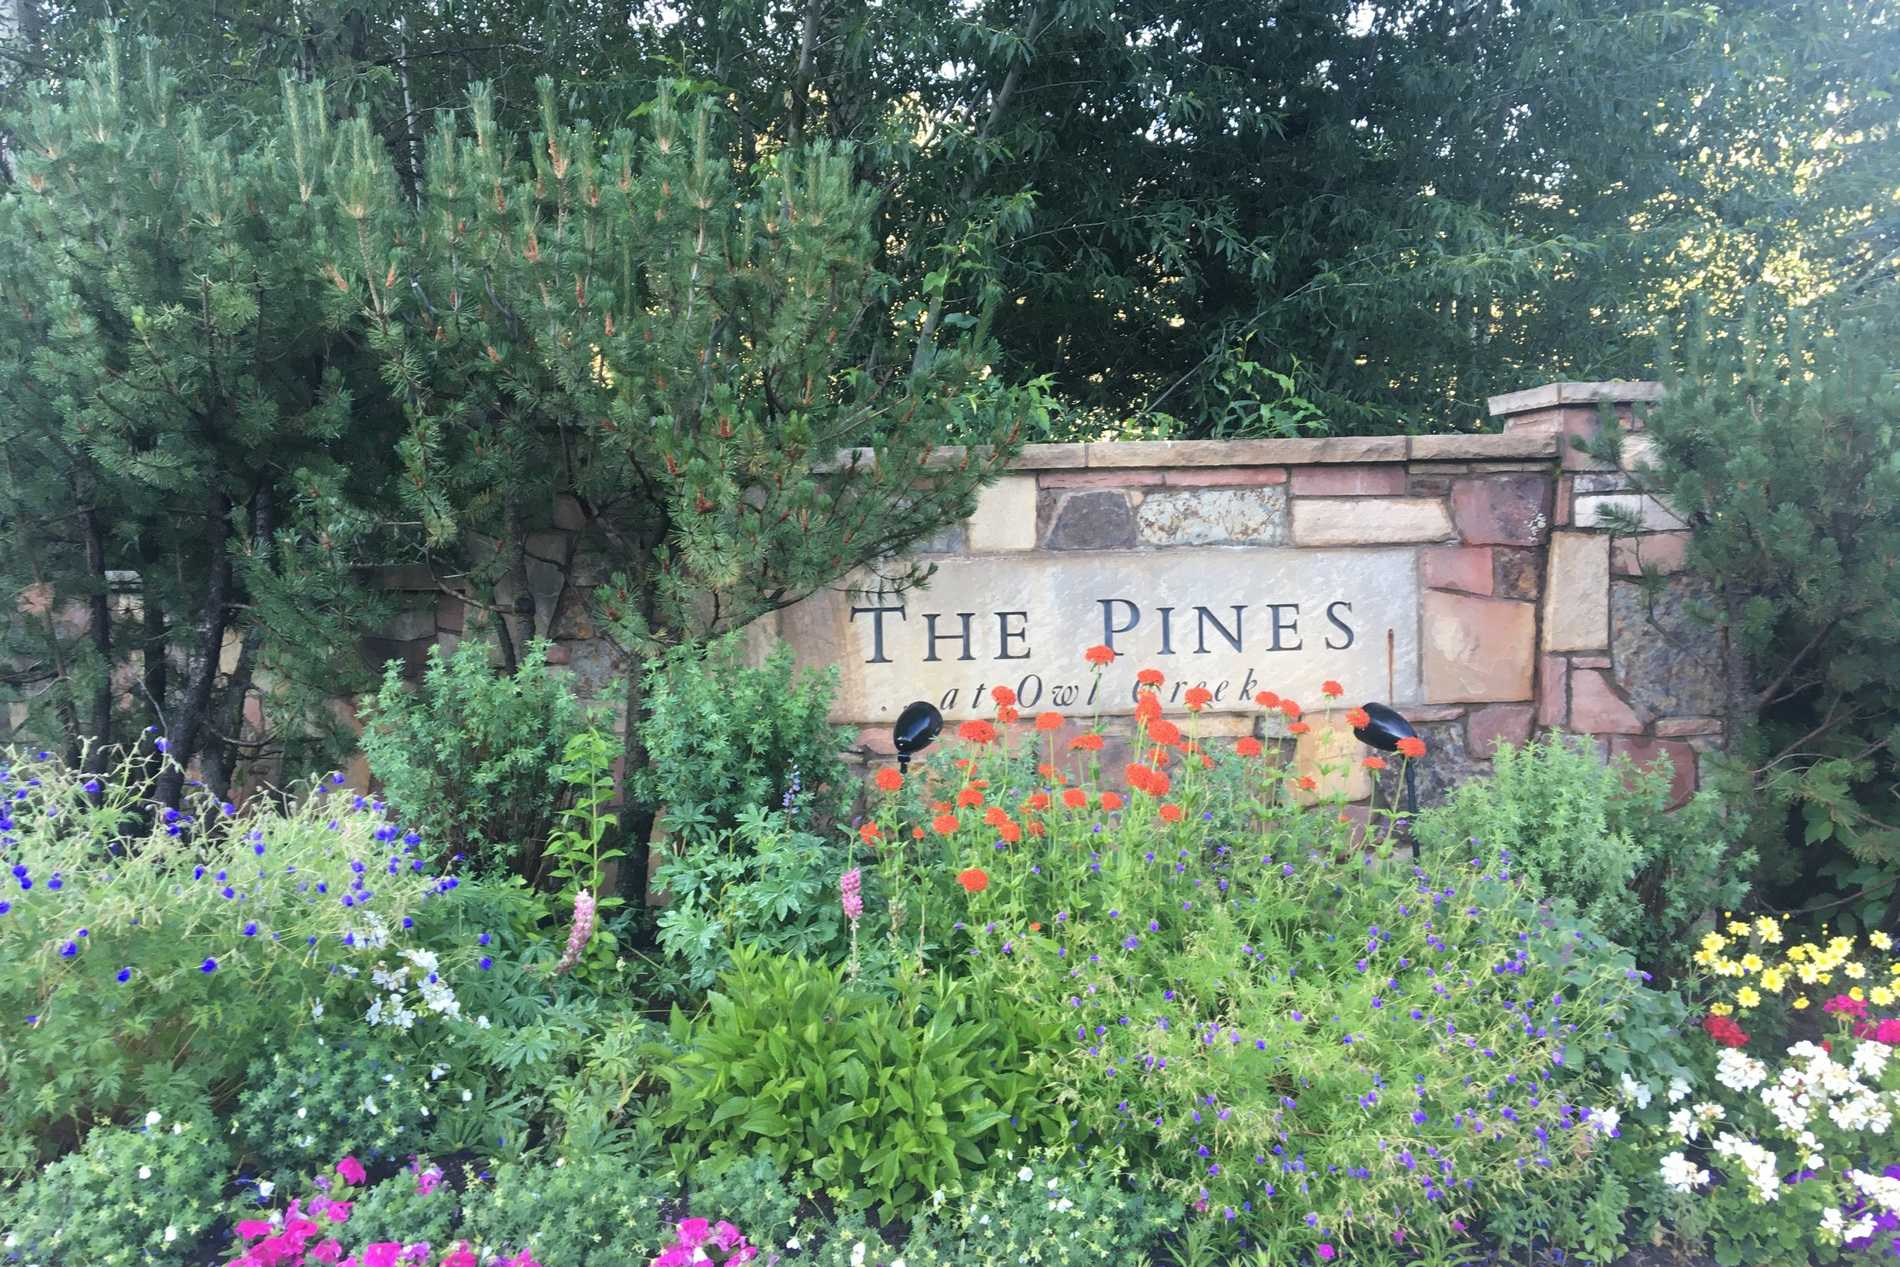 460 Pine Crest Drive Snowmass Village Photo 1